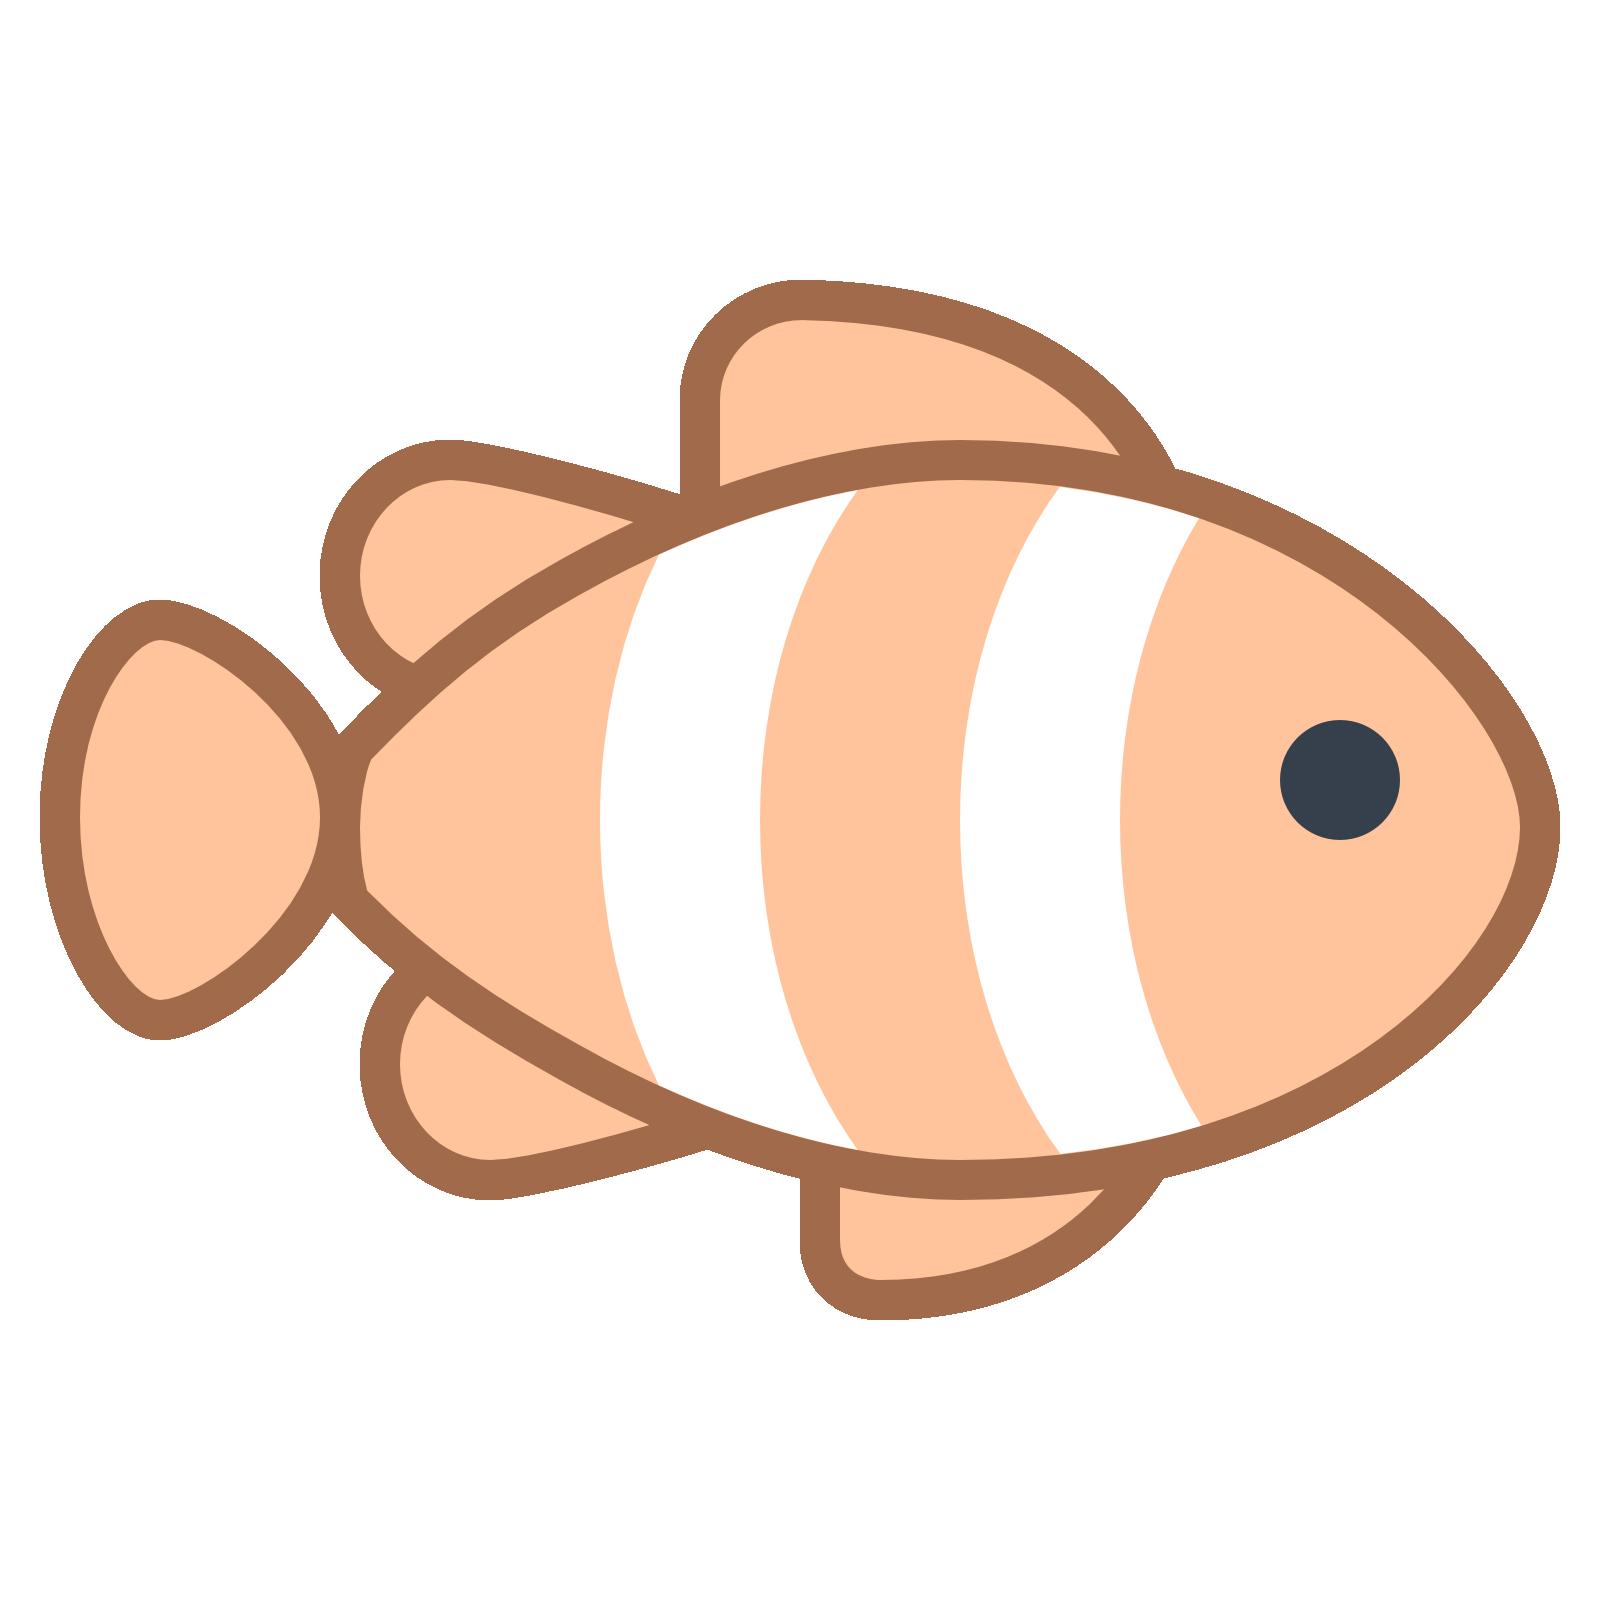 Computer icons clip art. Fish clipart baby fish